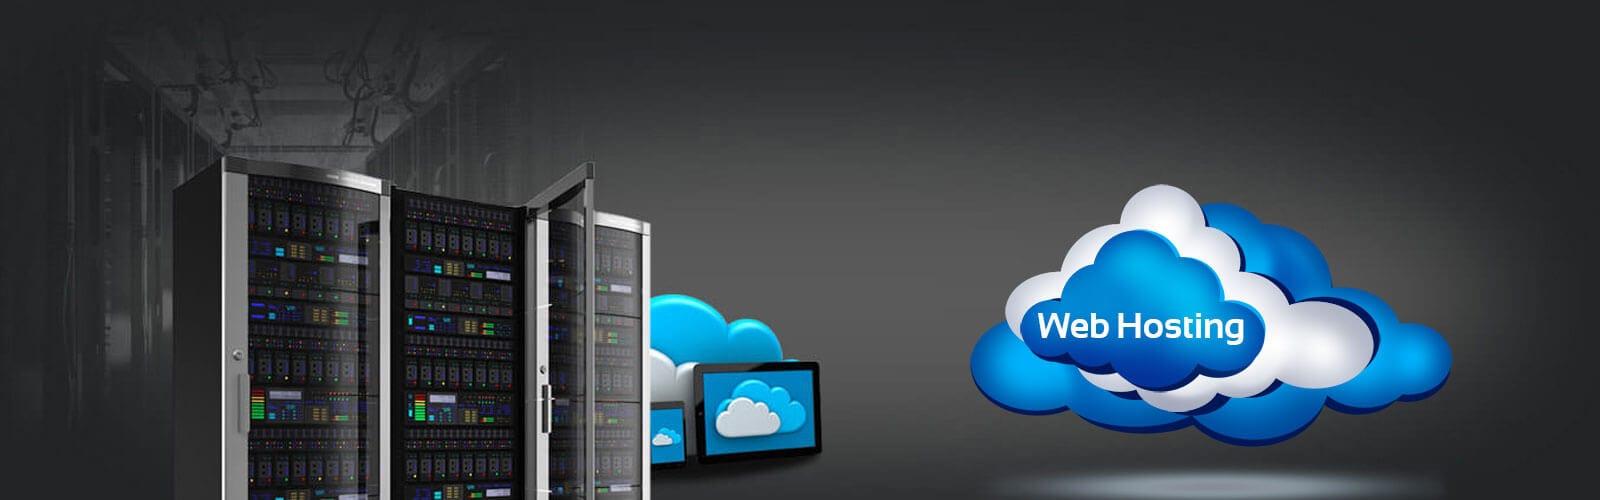 web-hosting-server-location